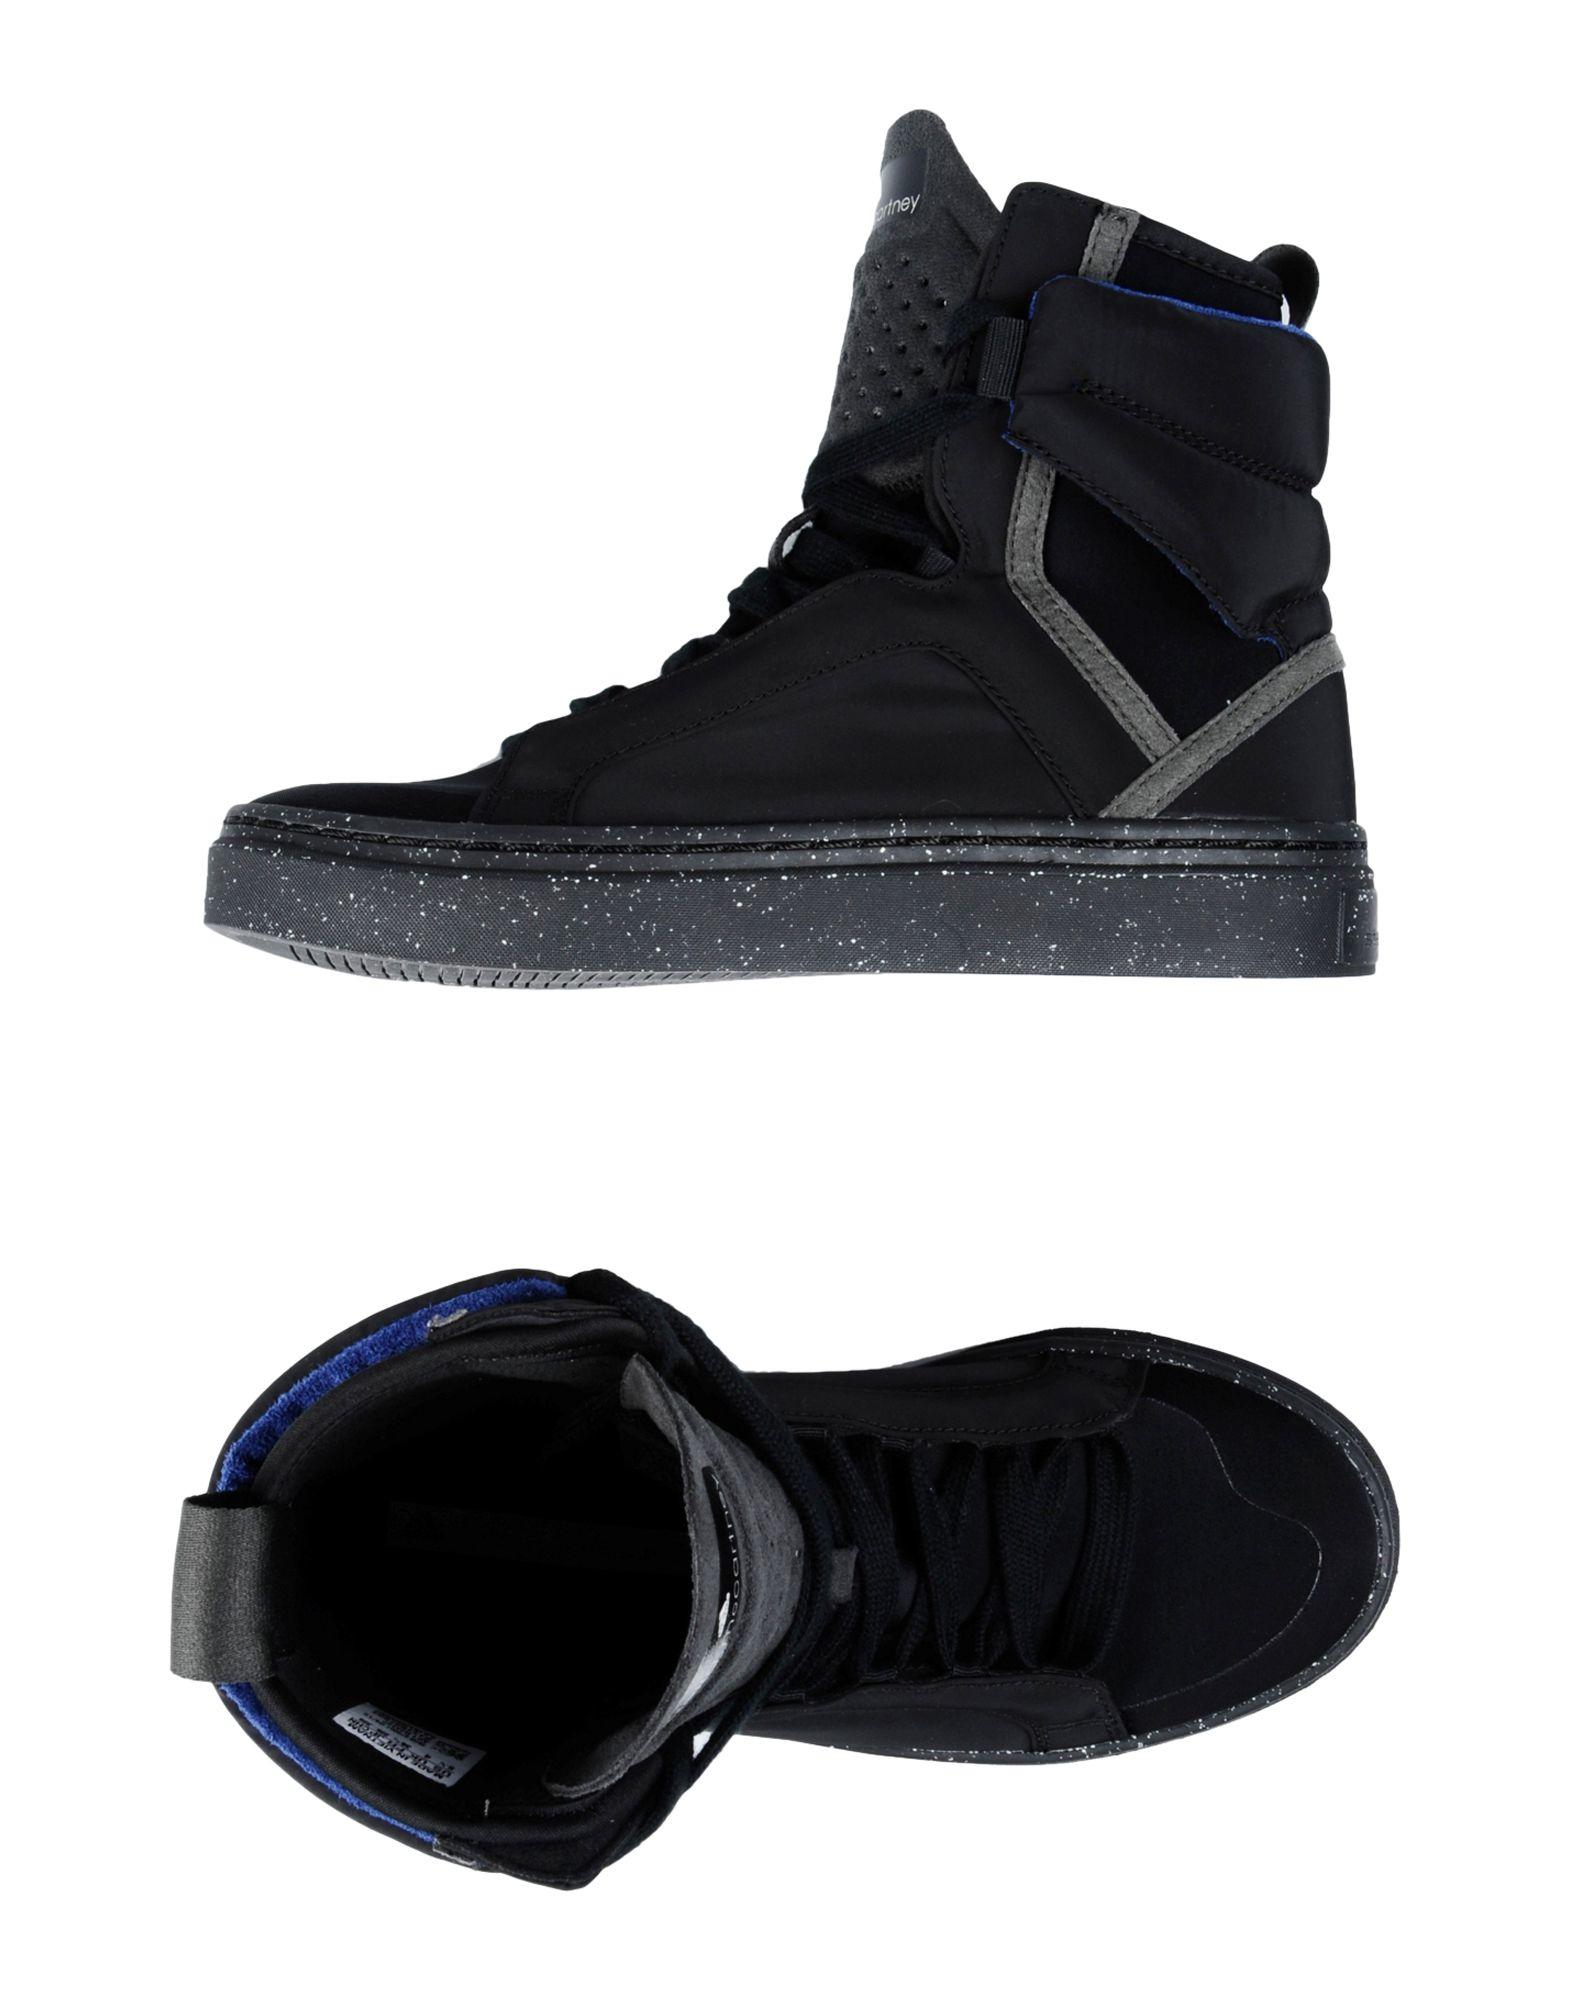 adidas by stella mccartney high tops sneakers in black